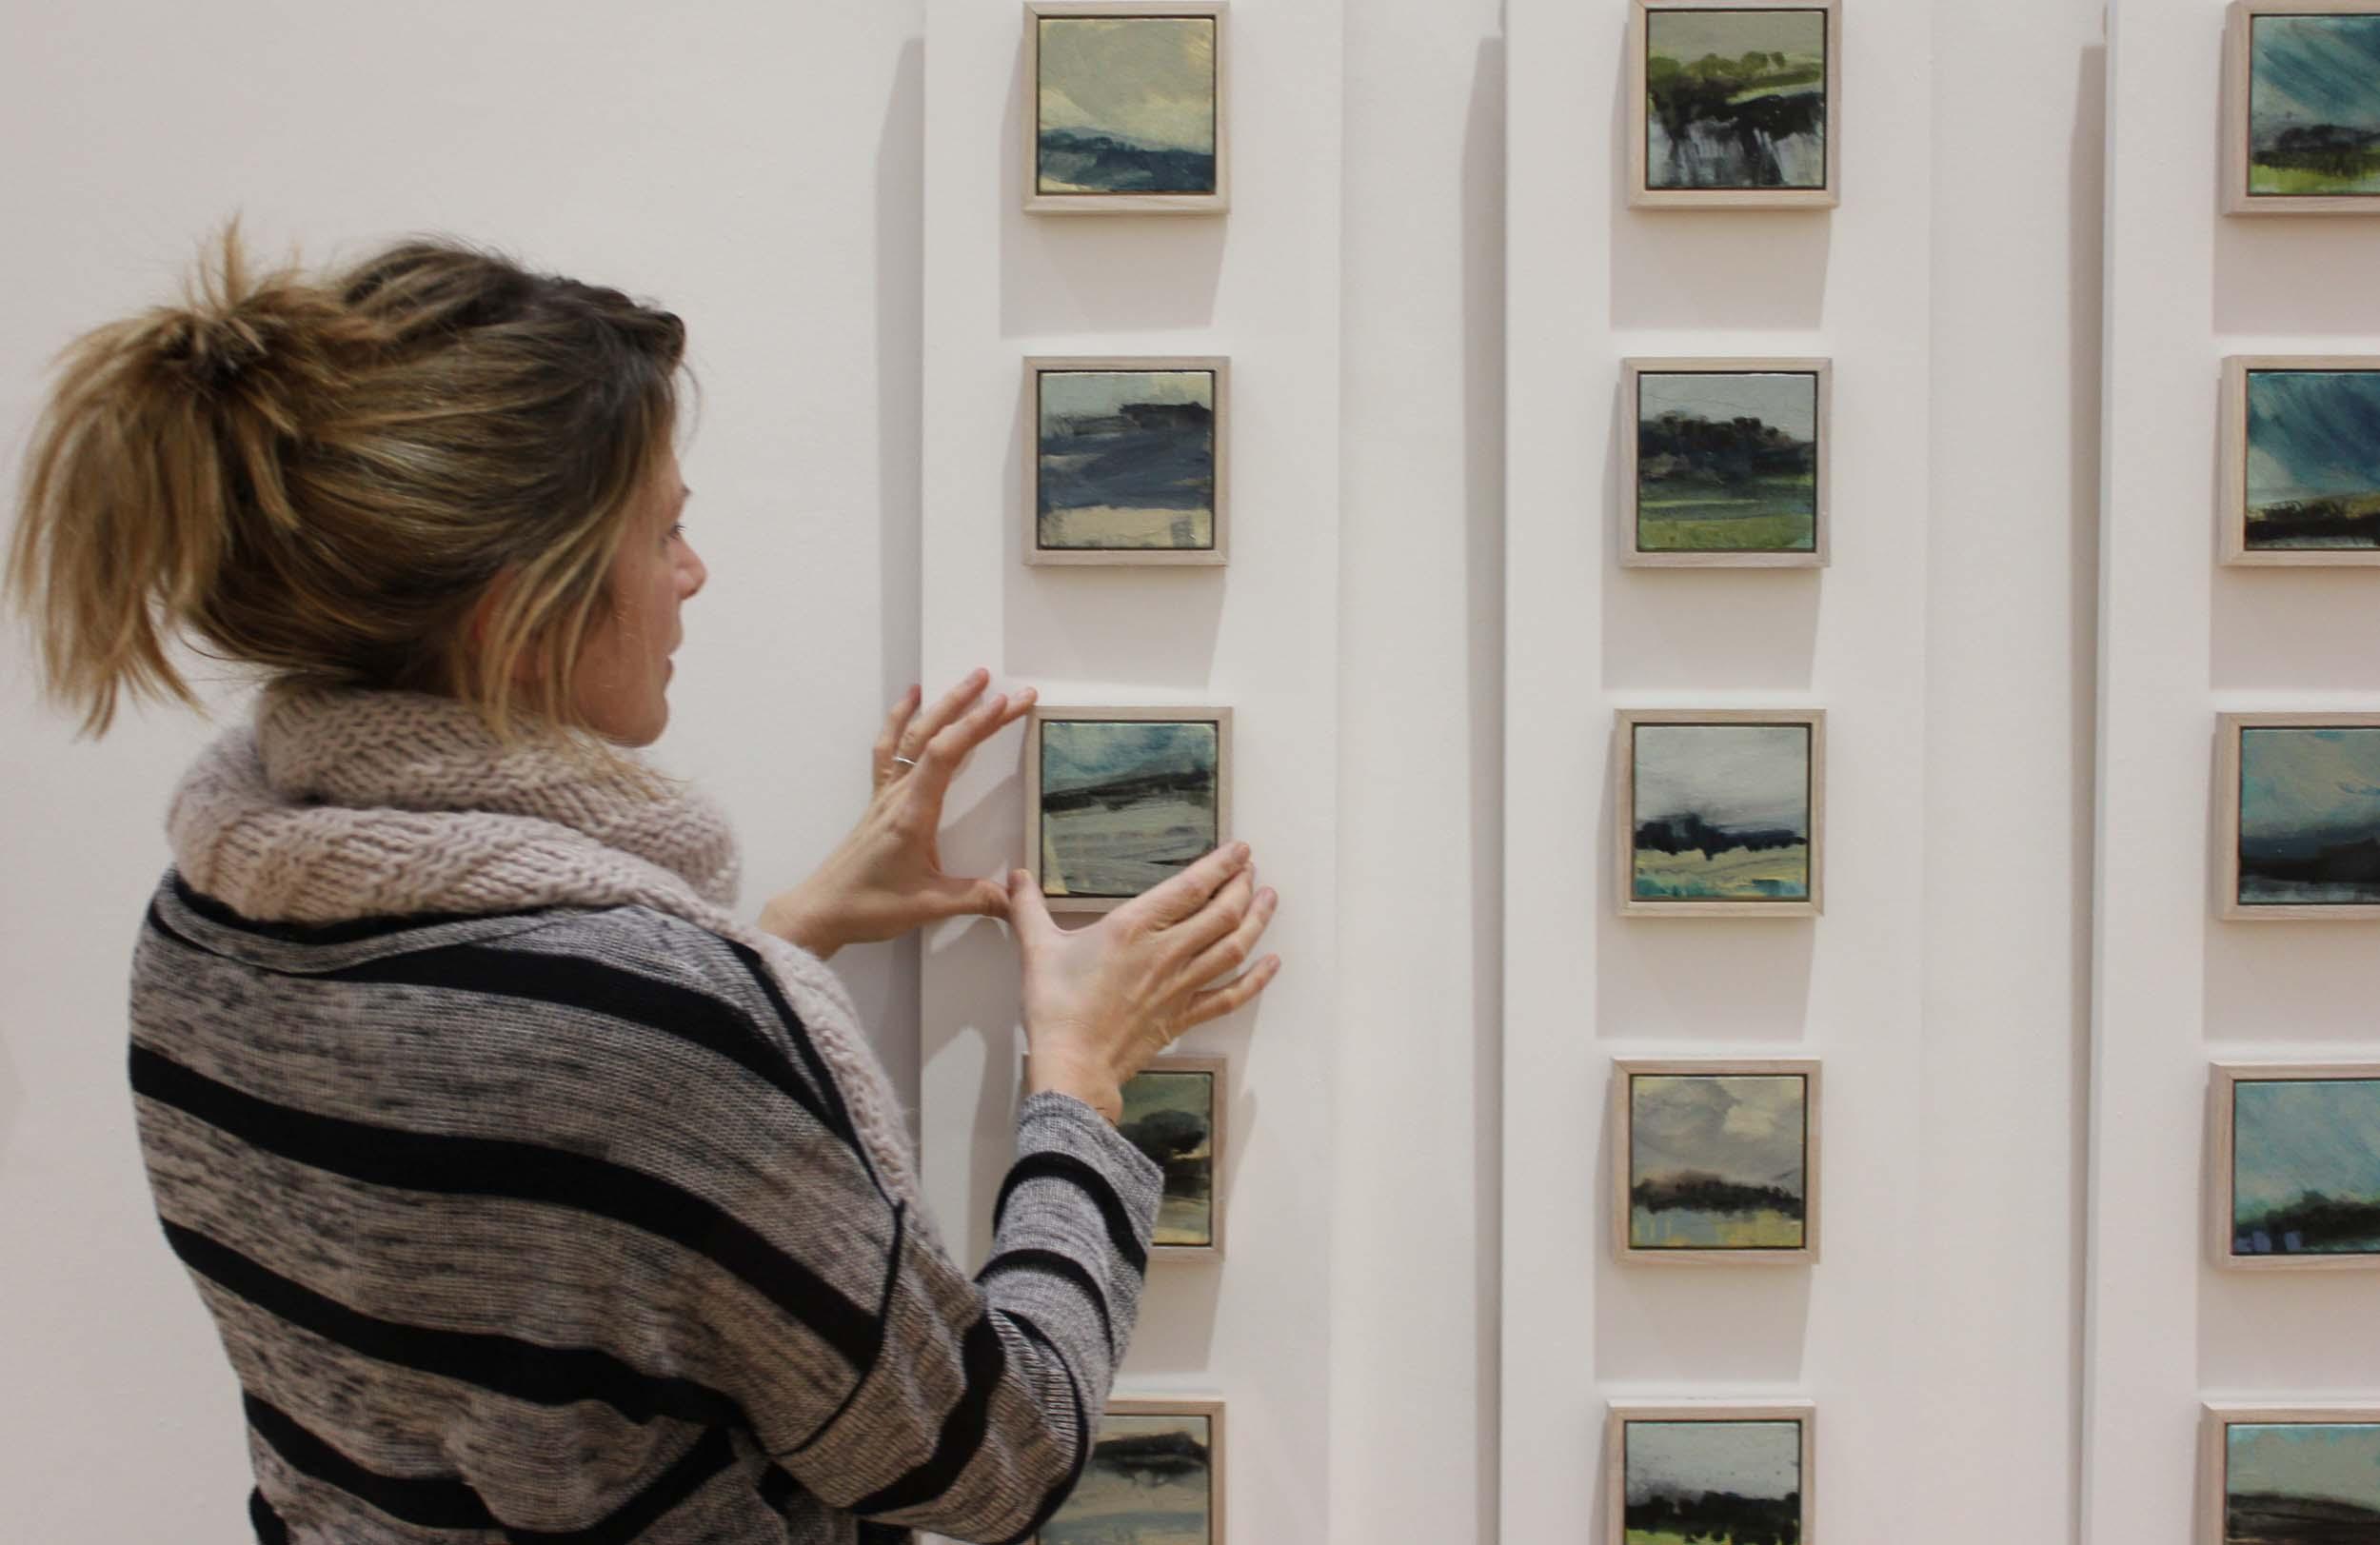 Installation view from 2013 Exhibition - Snapshots - A Connemara Journey